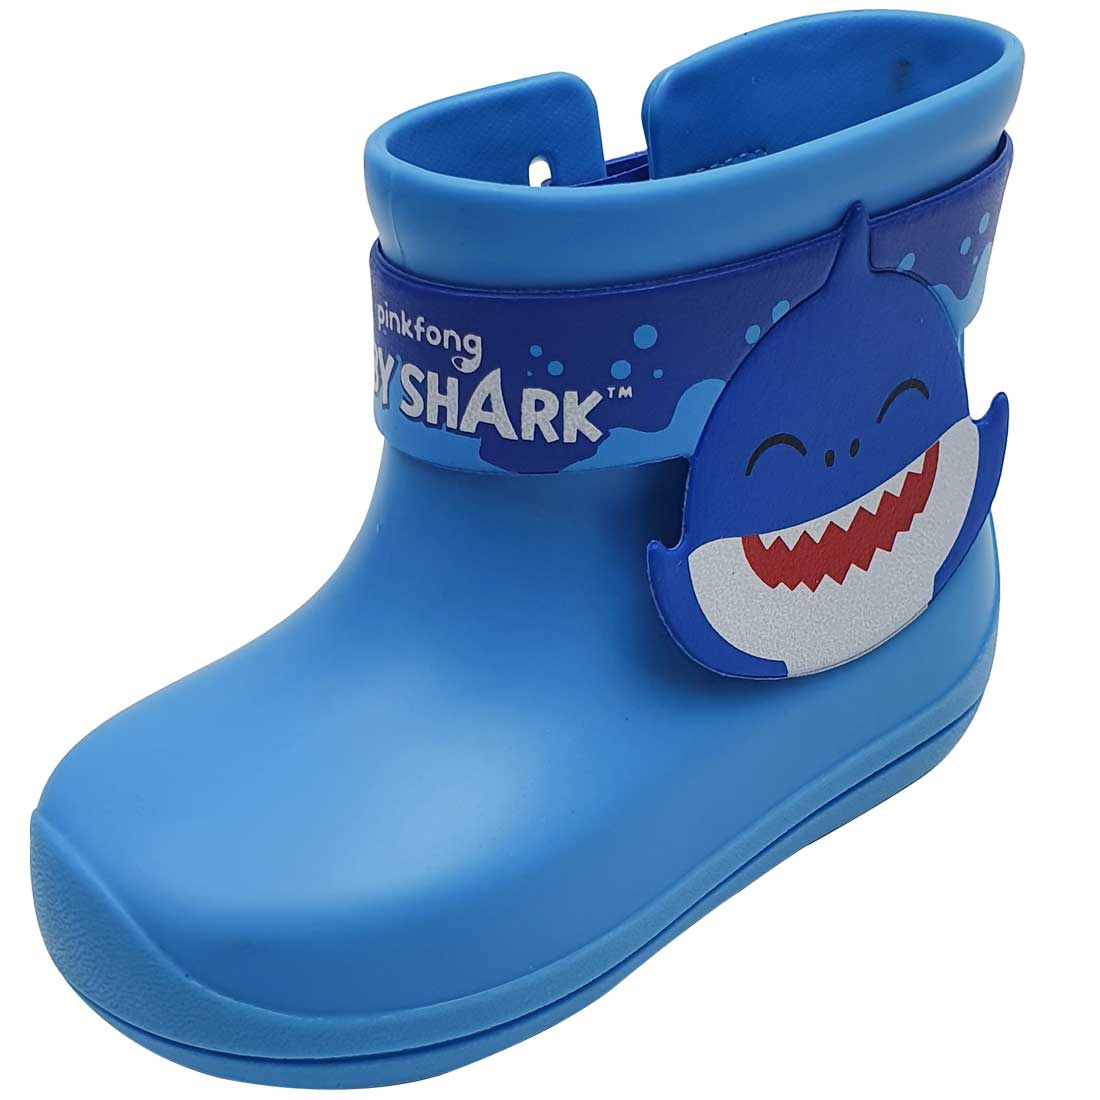 Galocha Baby Shark Splash - Azul